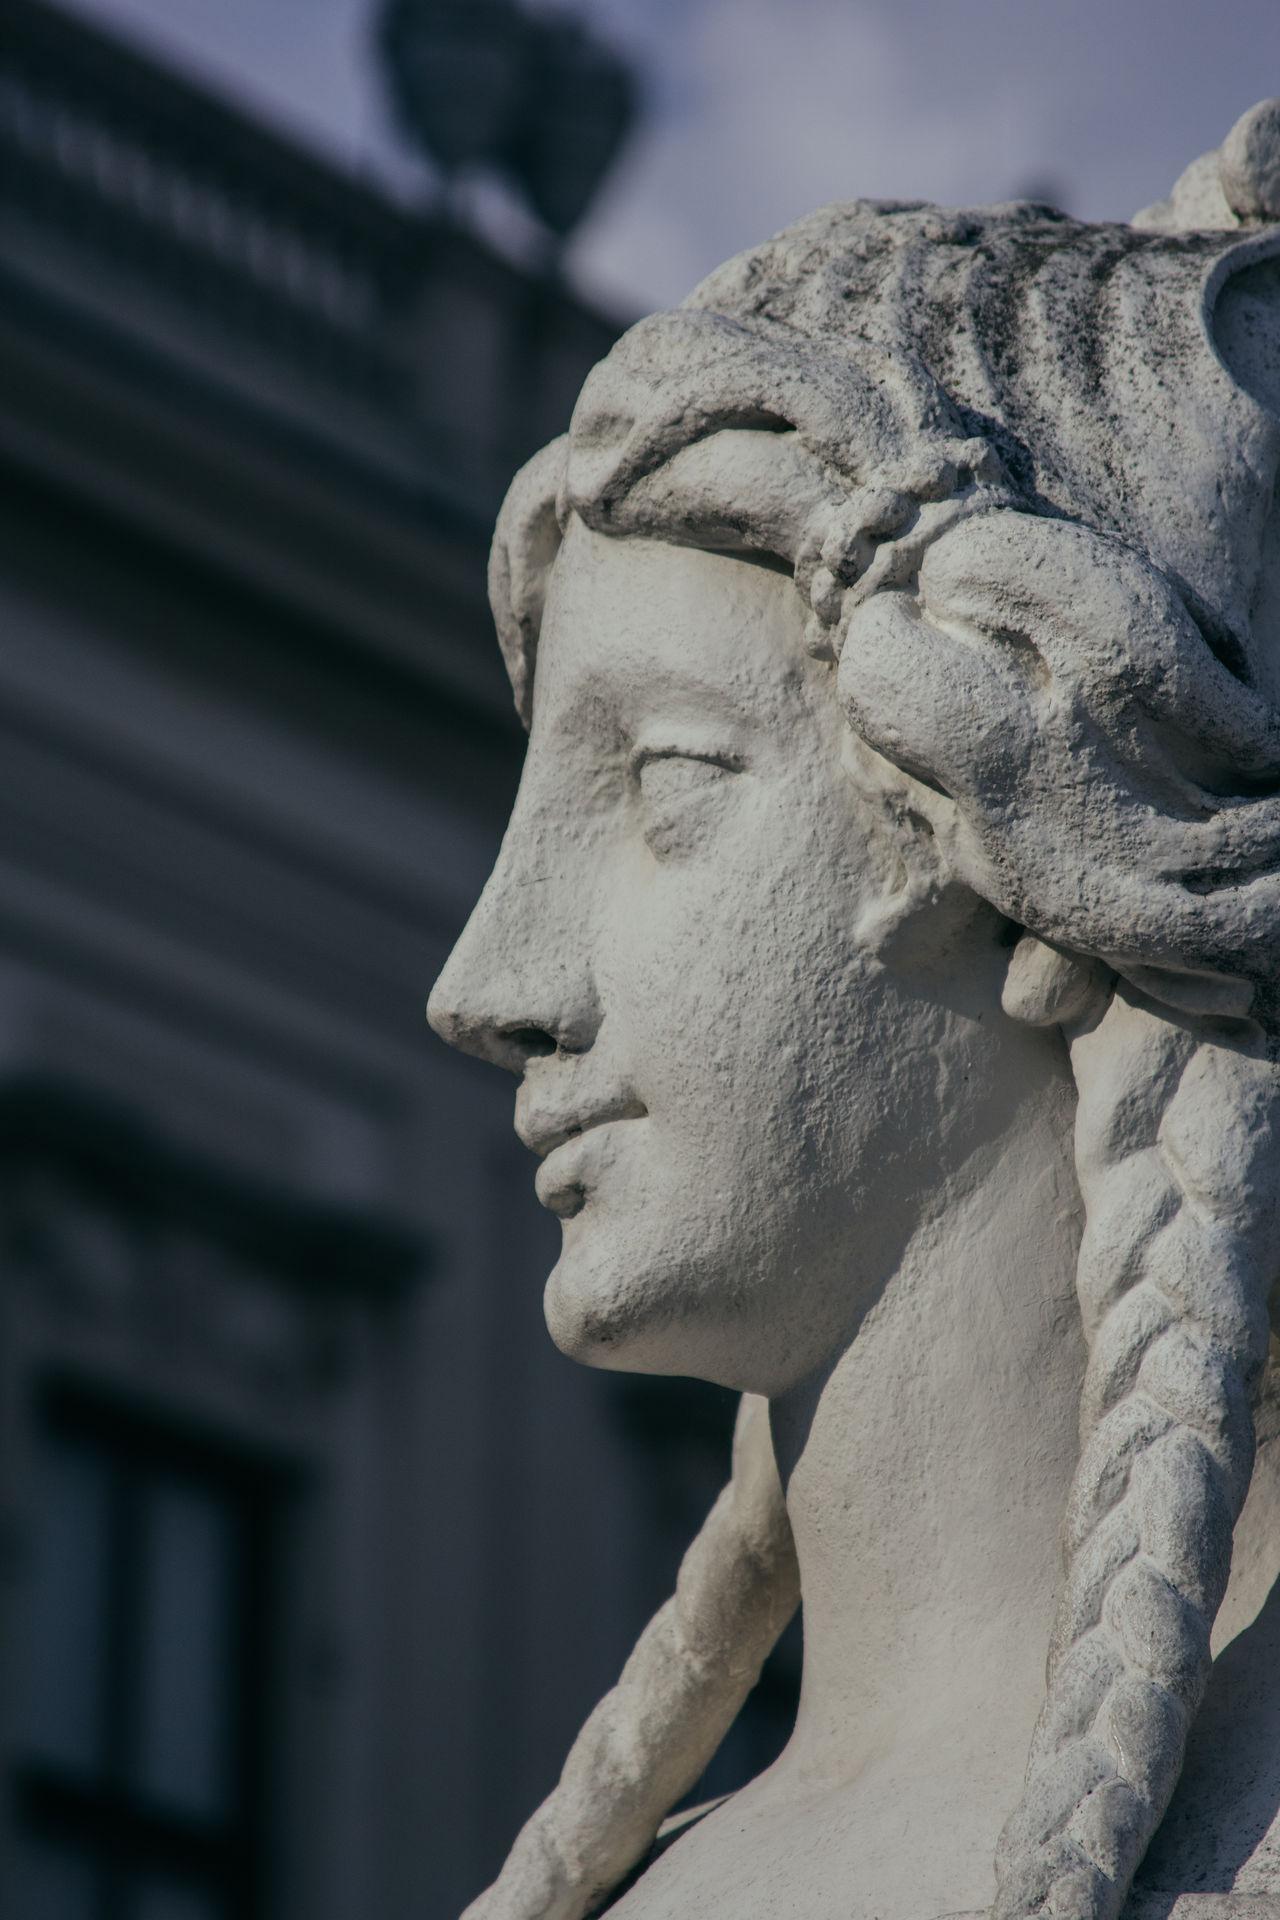 Art Close-up History Human Representation Outdoors Sculpture Statue Stone Material